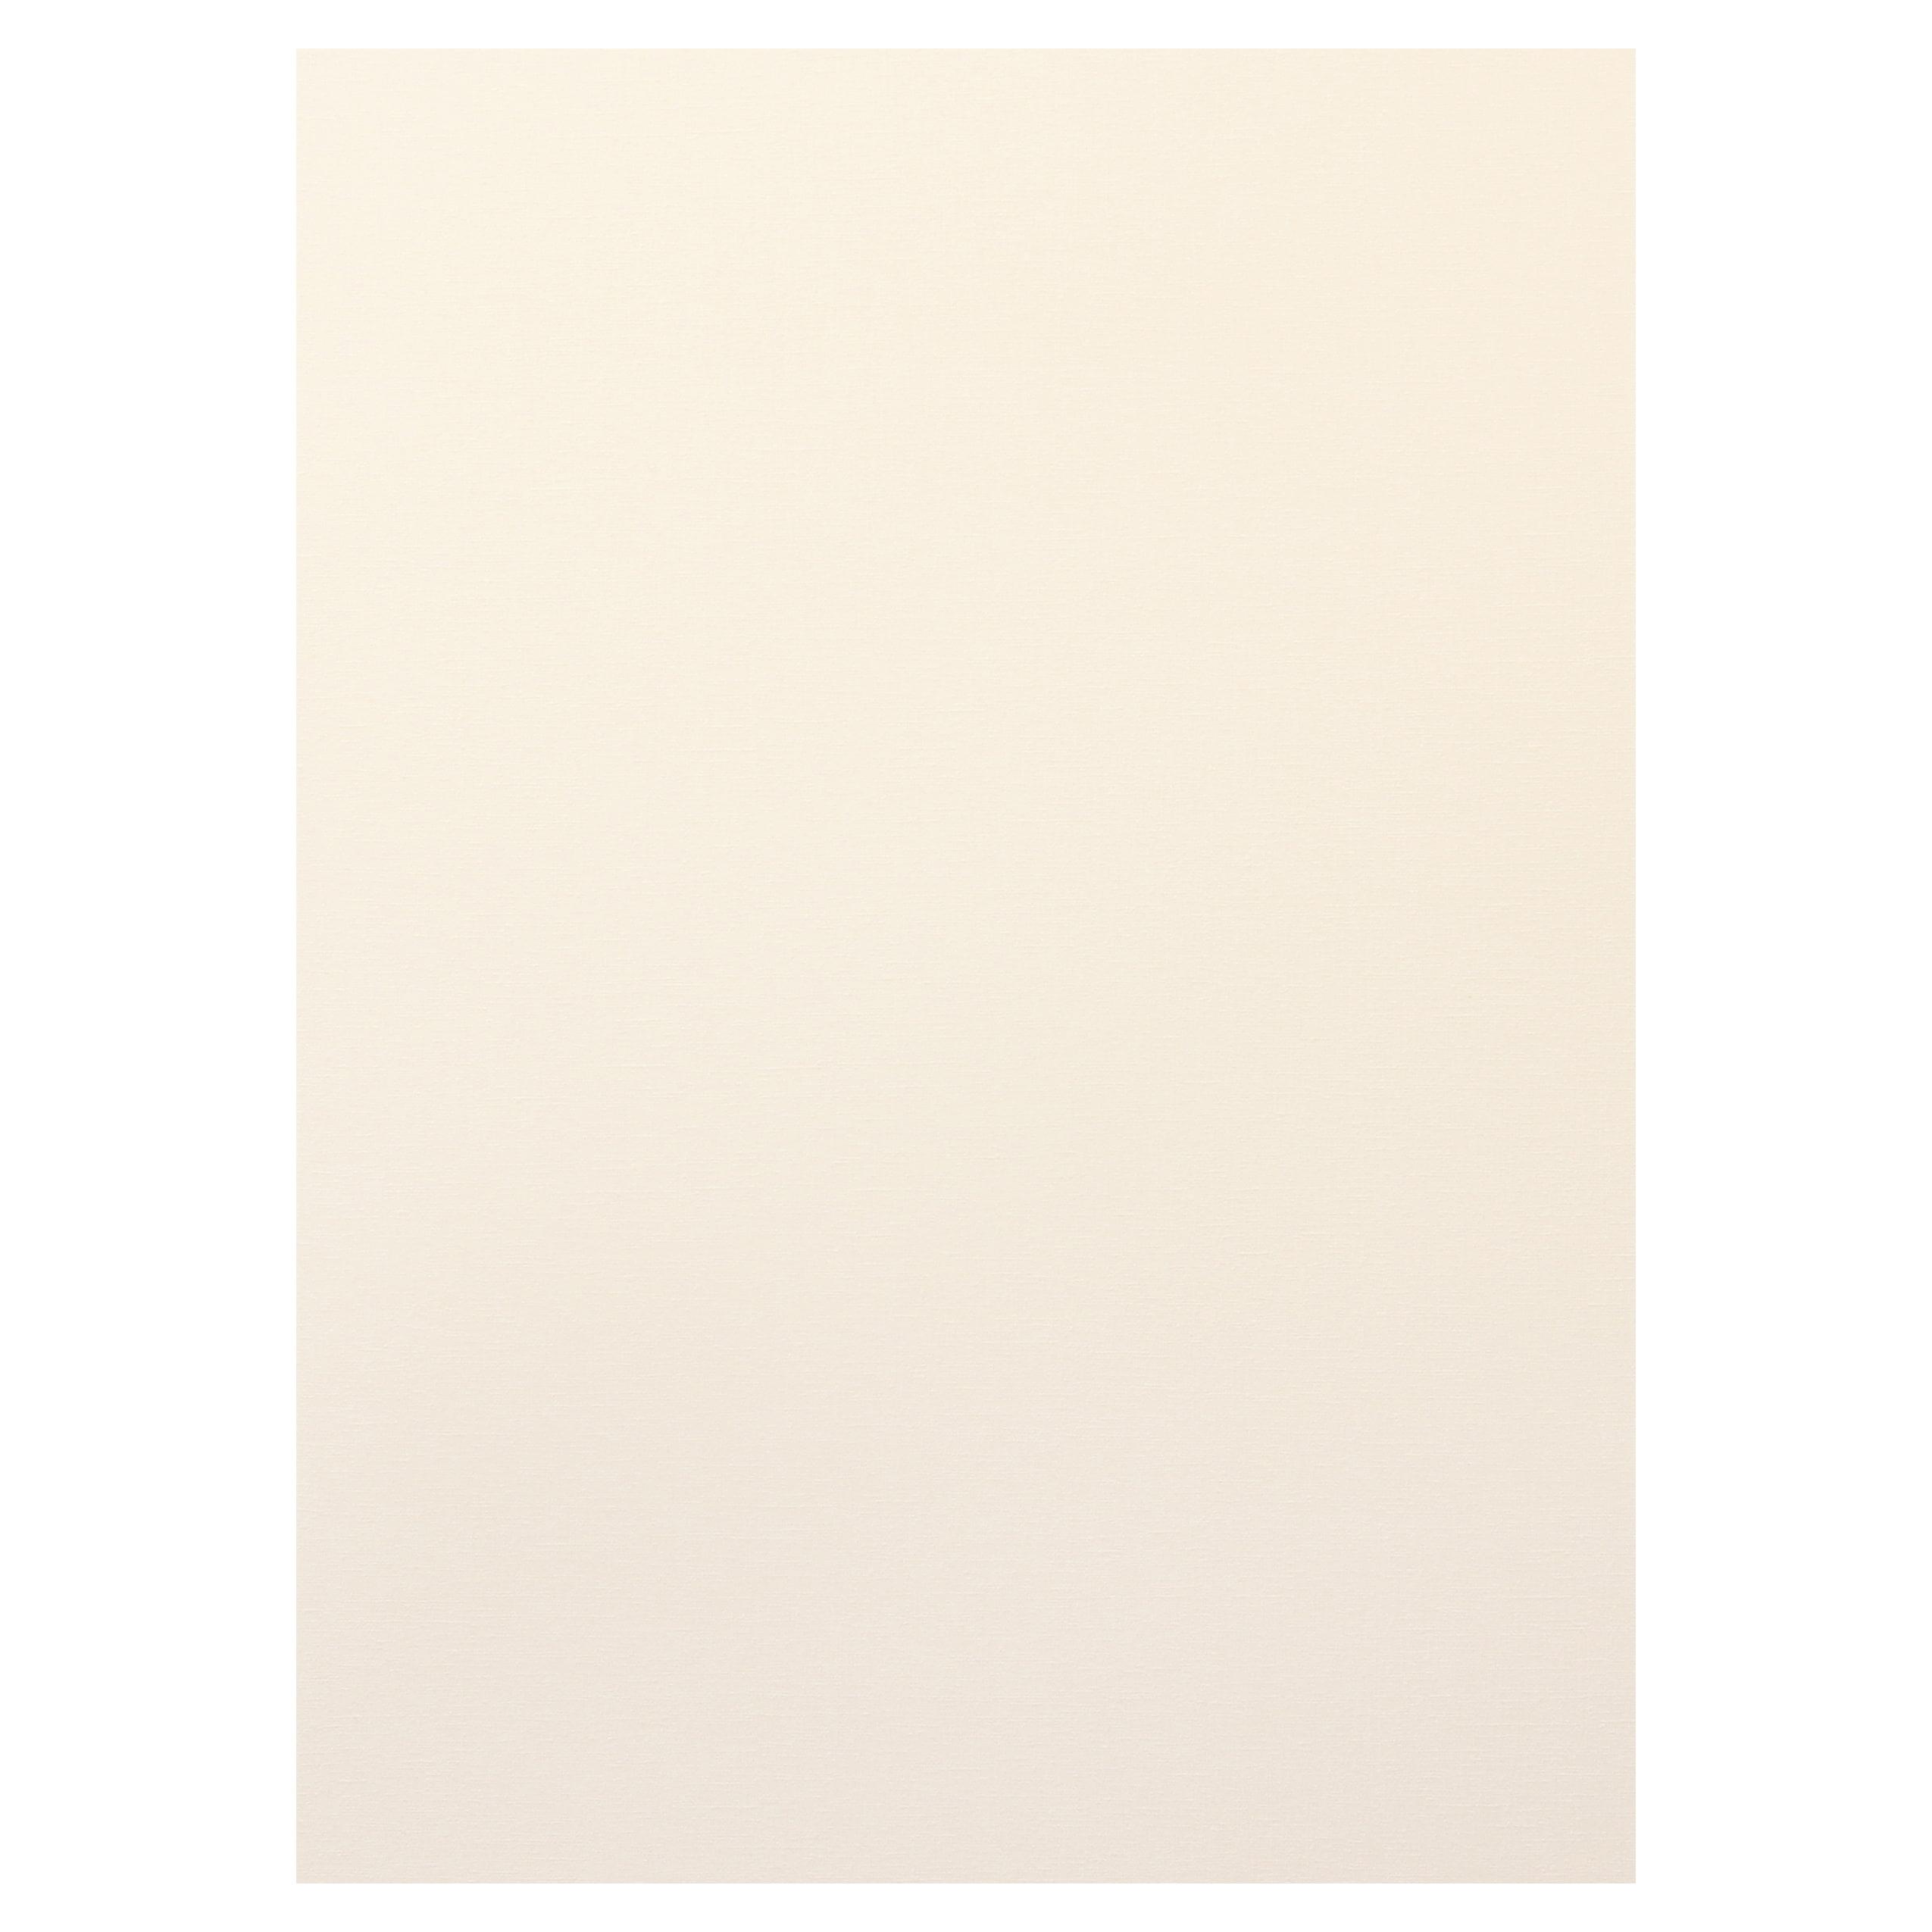 A4カード+α TSギフト1 ホワイト 232.6g